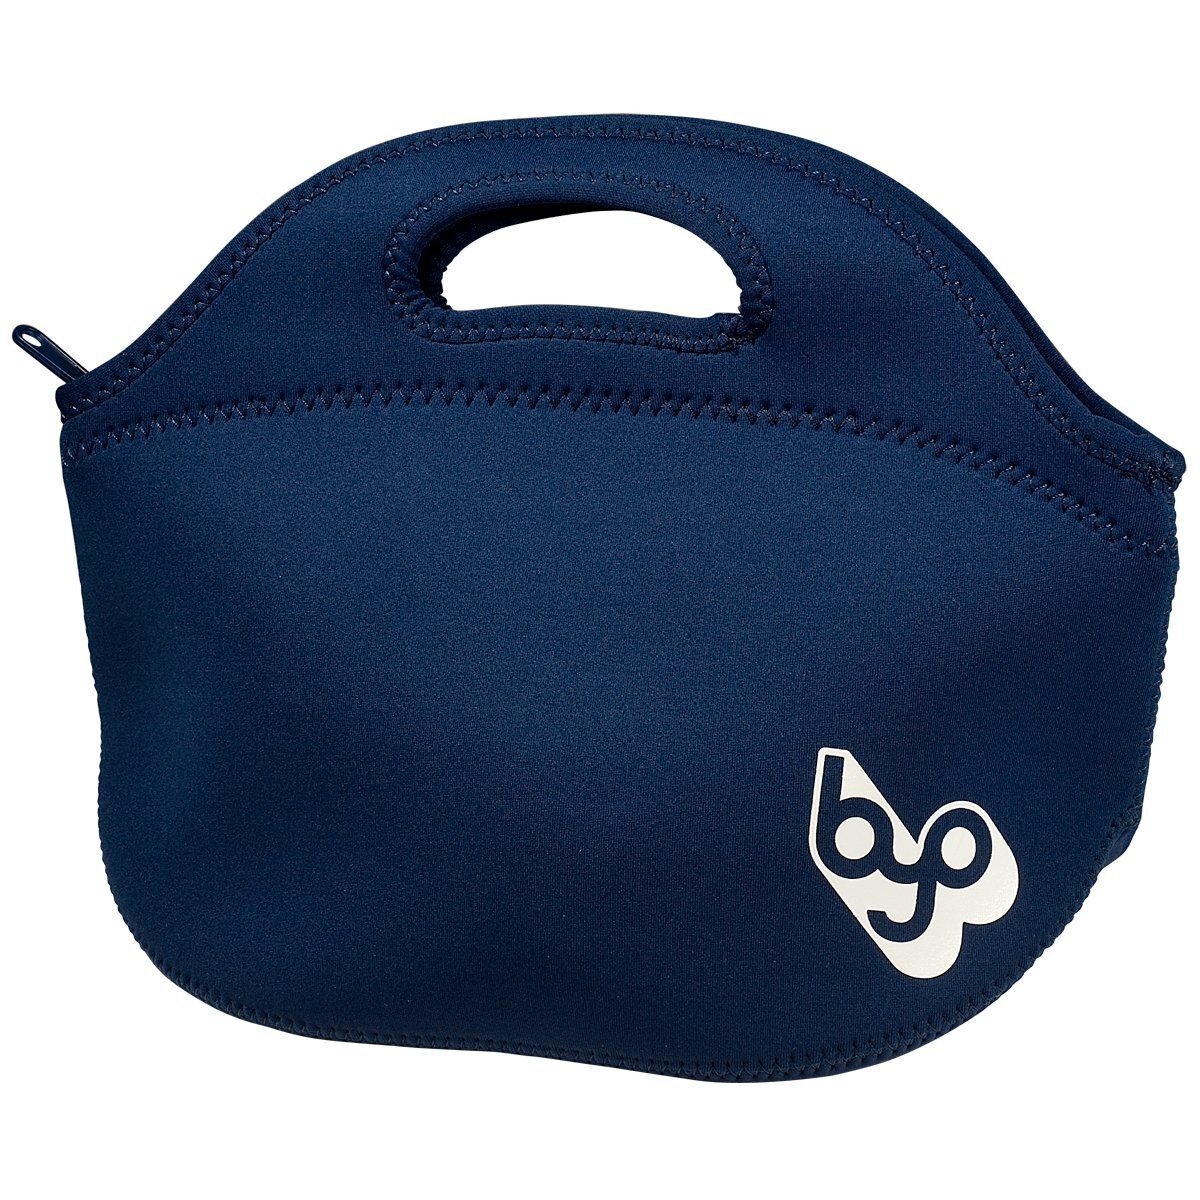 BYO® by BUILT® Rambler™ Lunch Bag